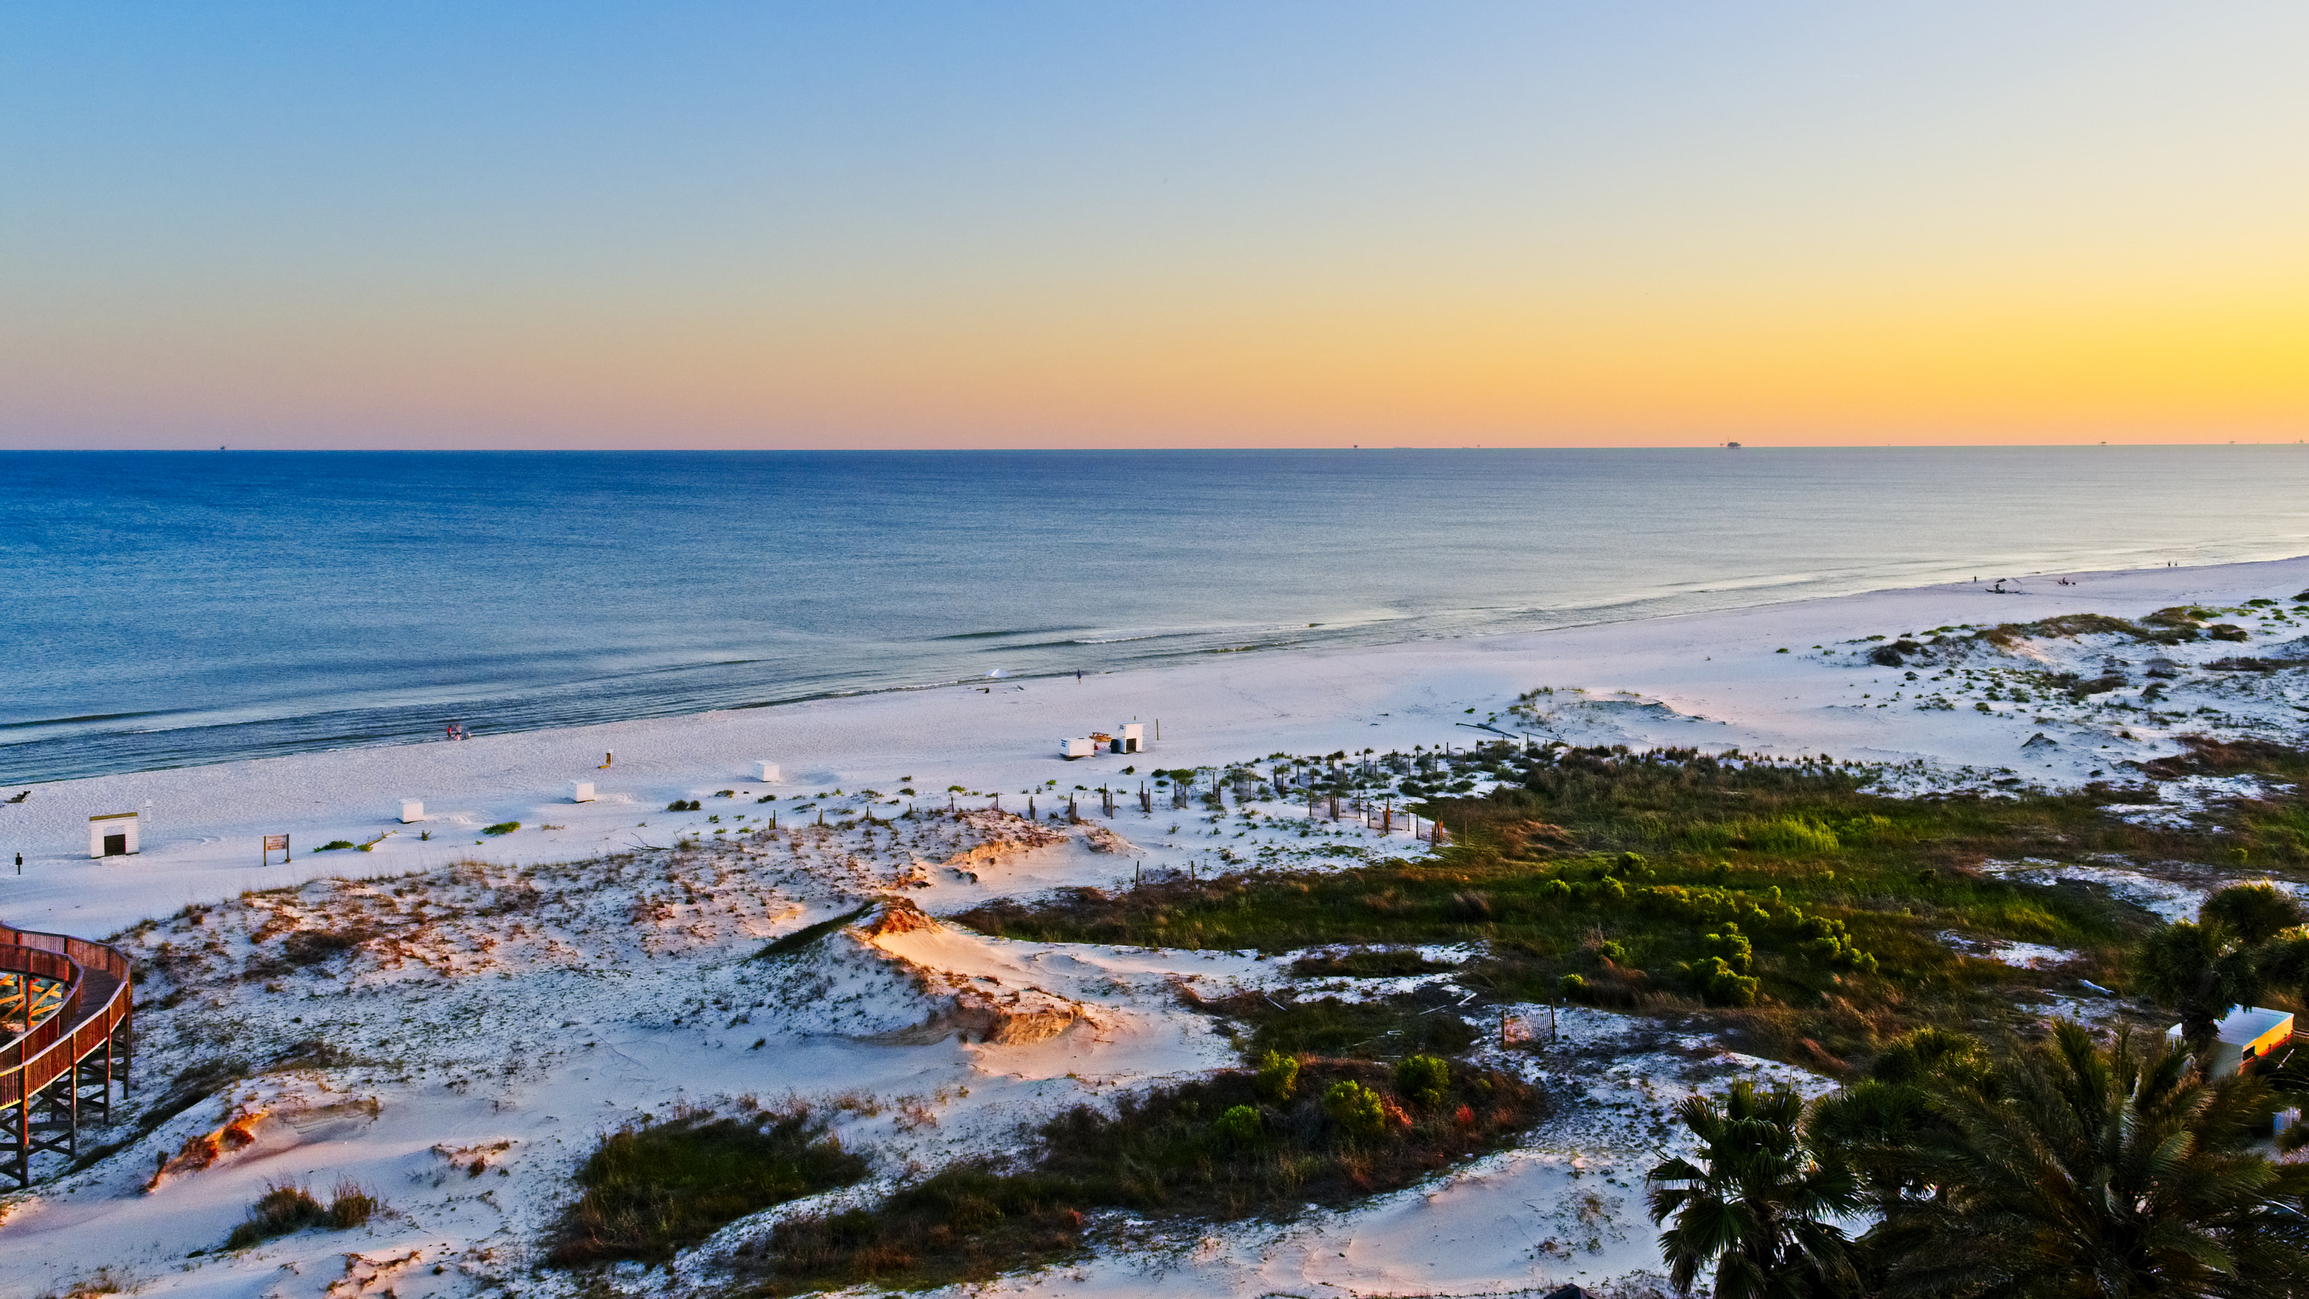 Gulf Shoresbanner image